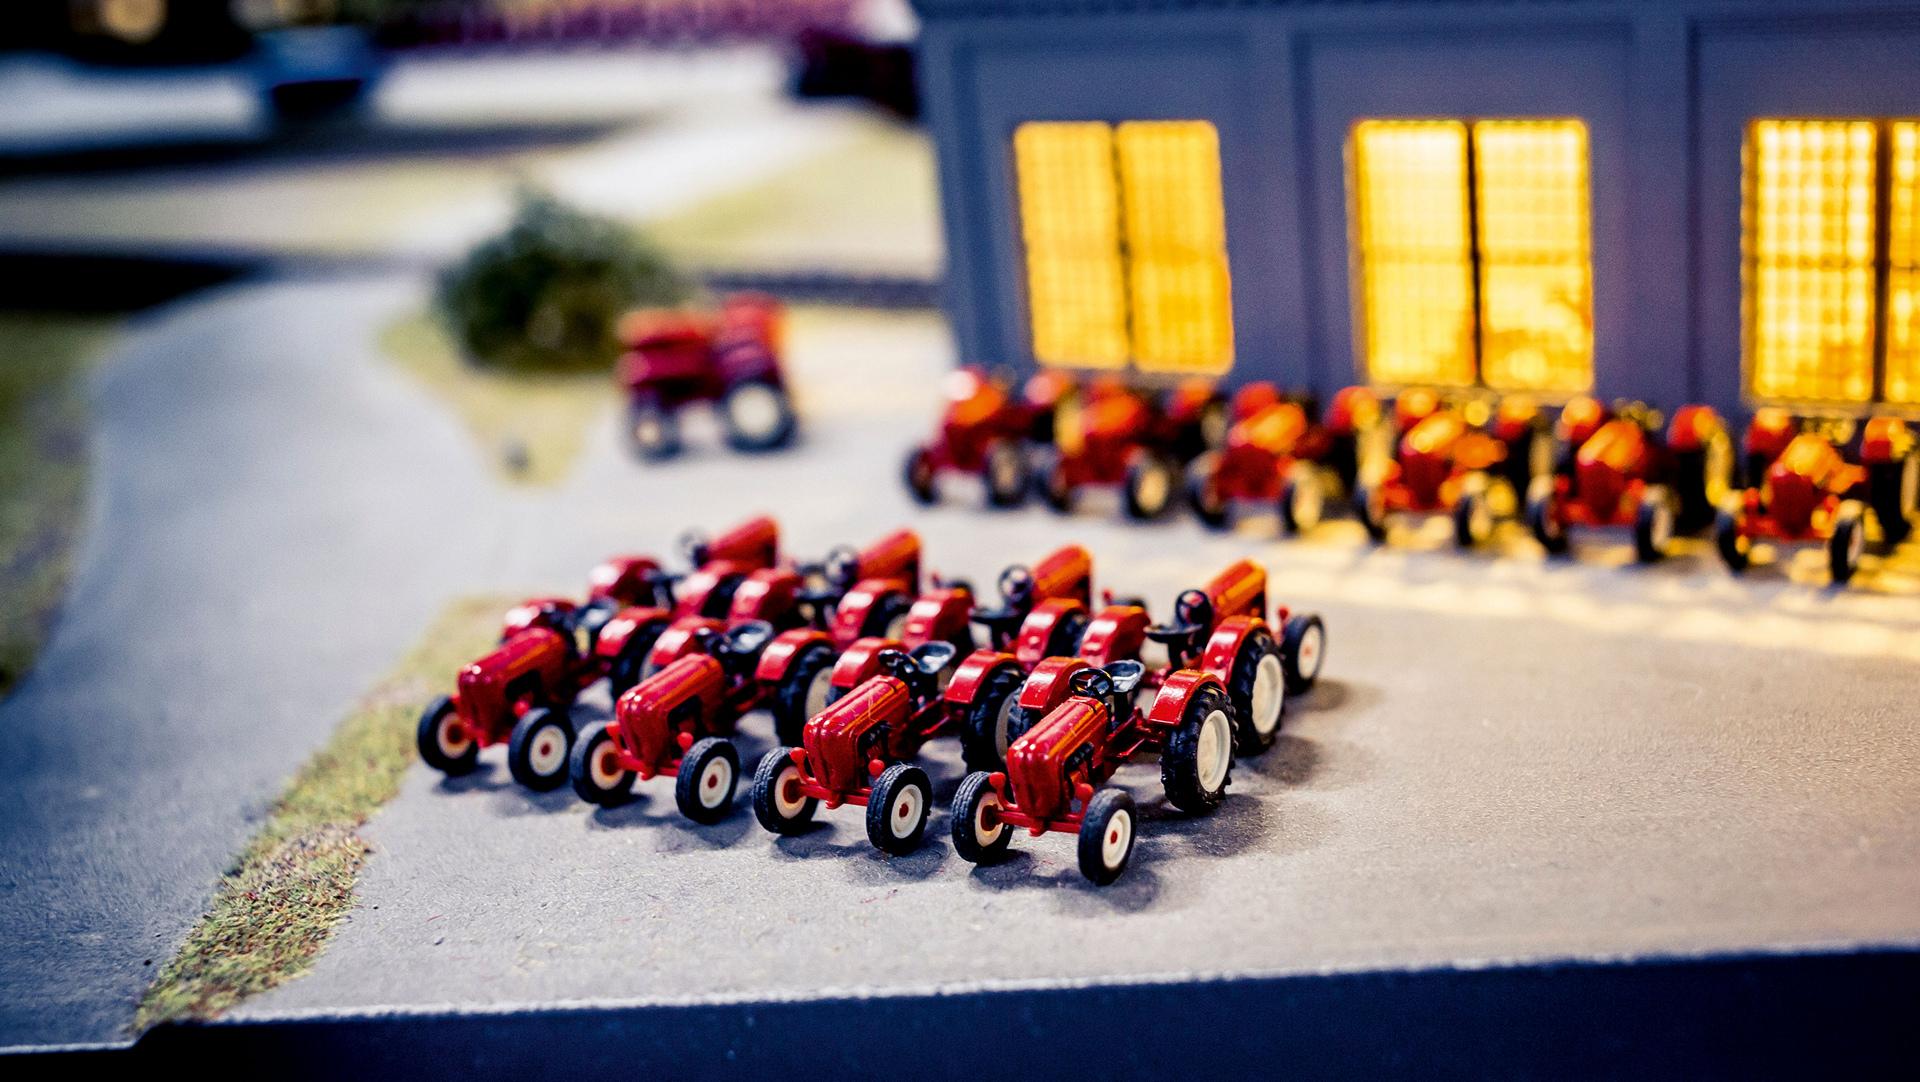 Tractors in miniature, TraumWerk © Dr. Ing. h.c. F. Porsche AG